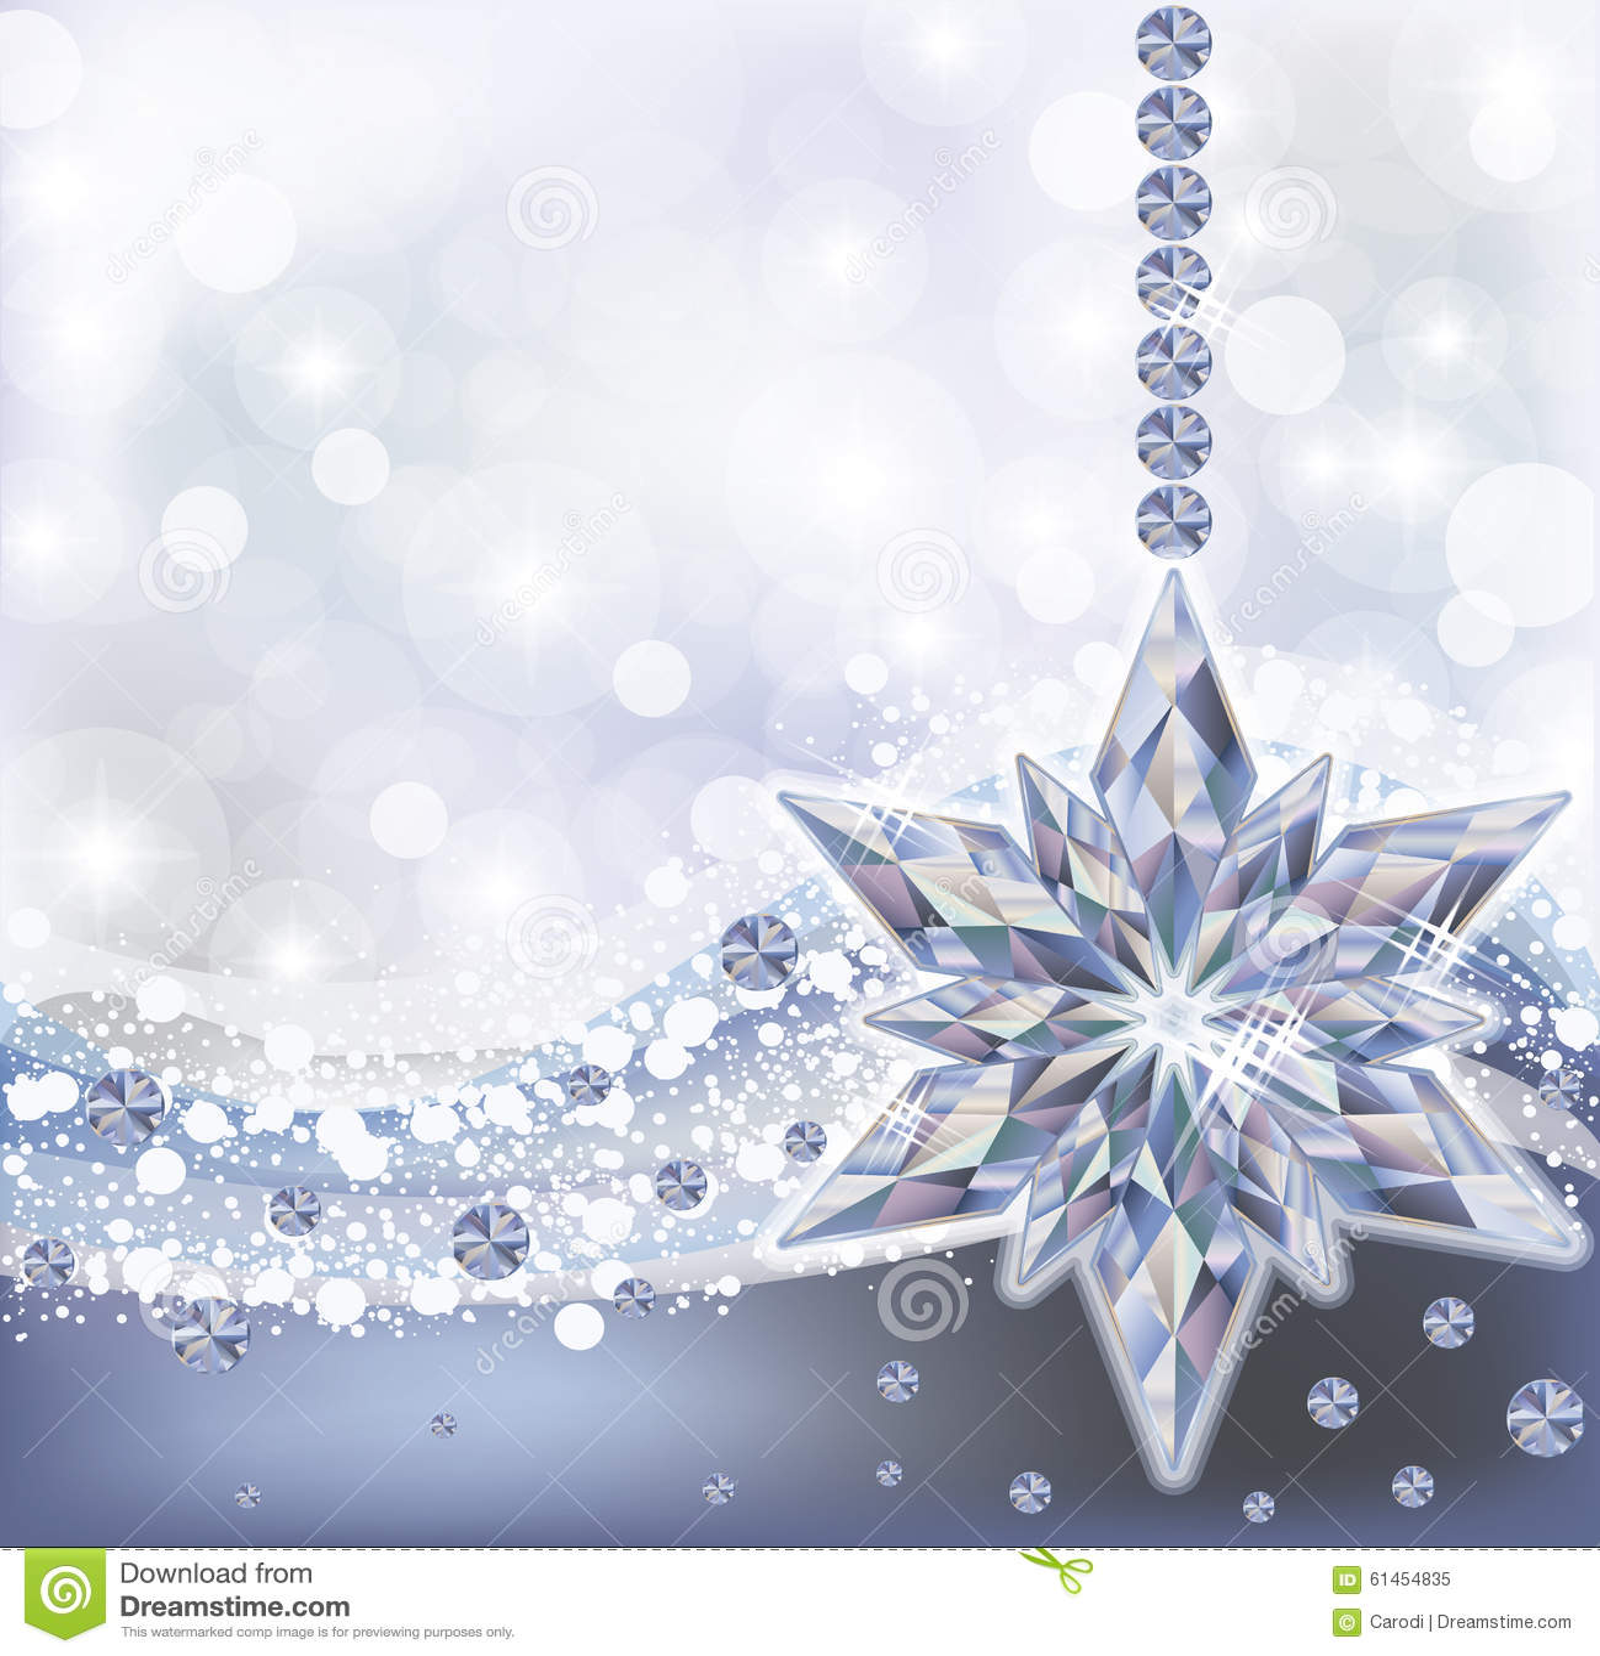 Frozen Wallpaper With Diamond Snowflake Vector Stock